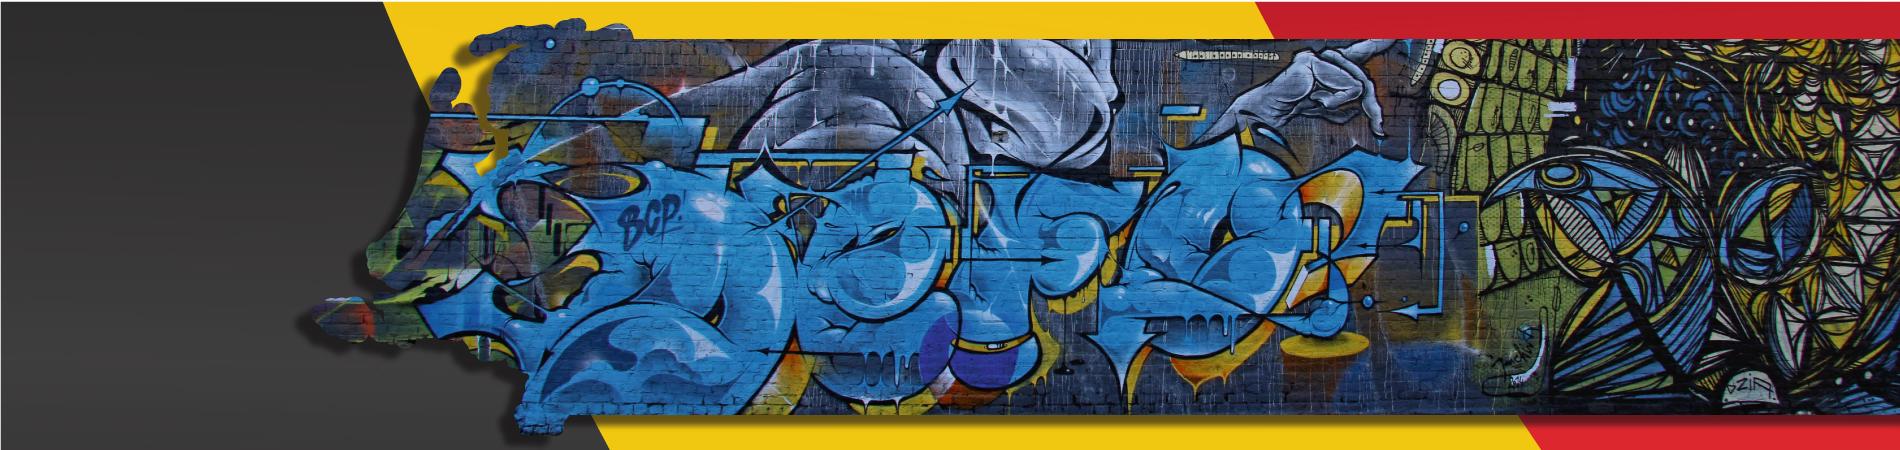 Choose your tour Ghent Graffiti